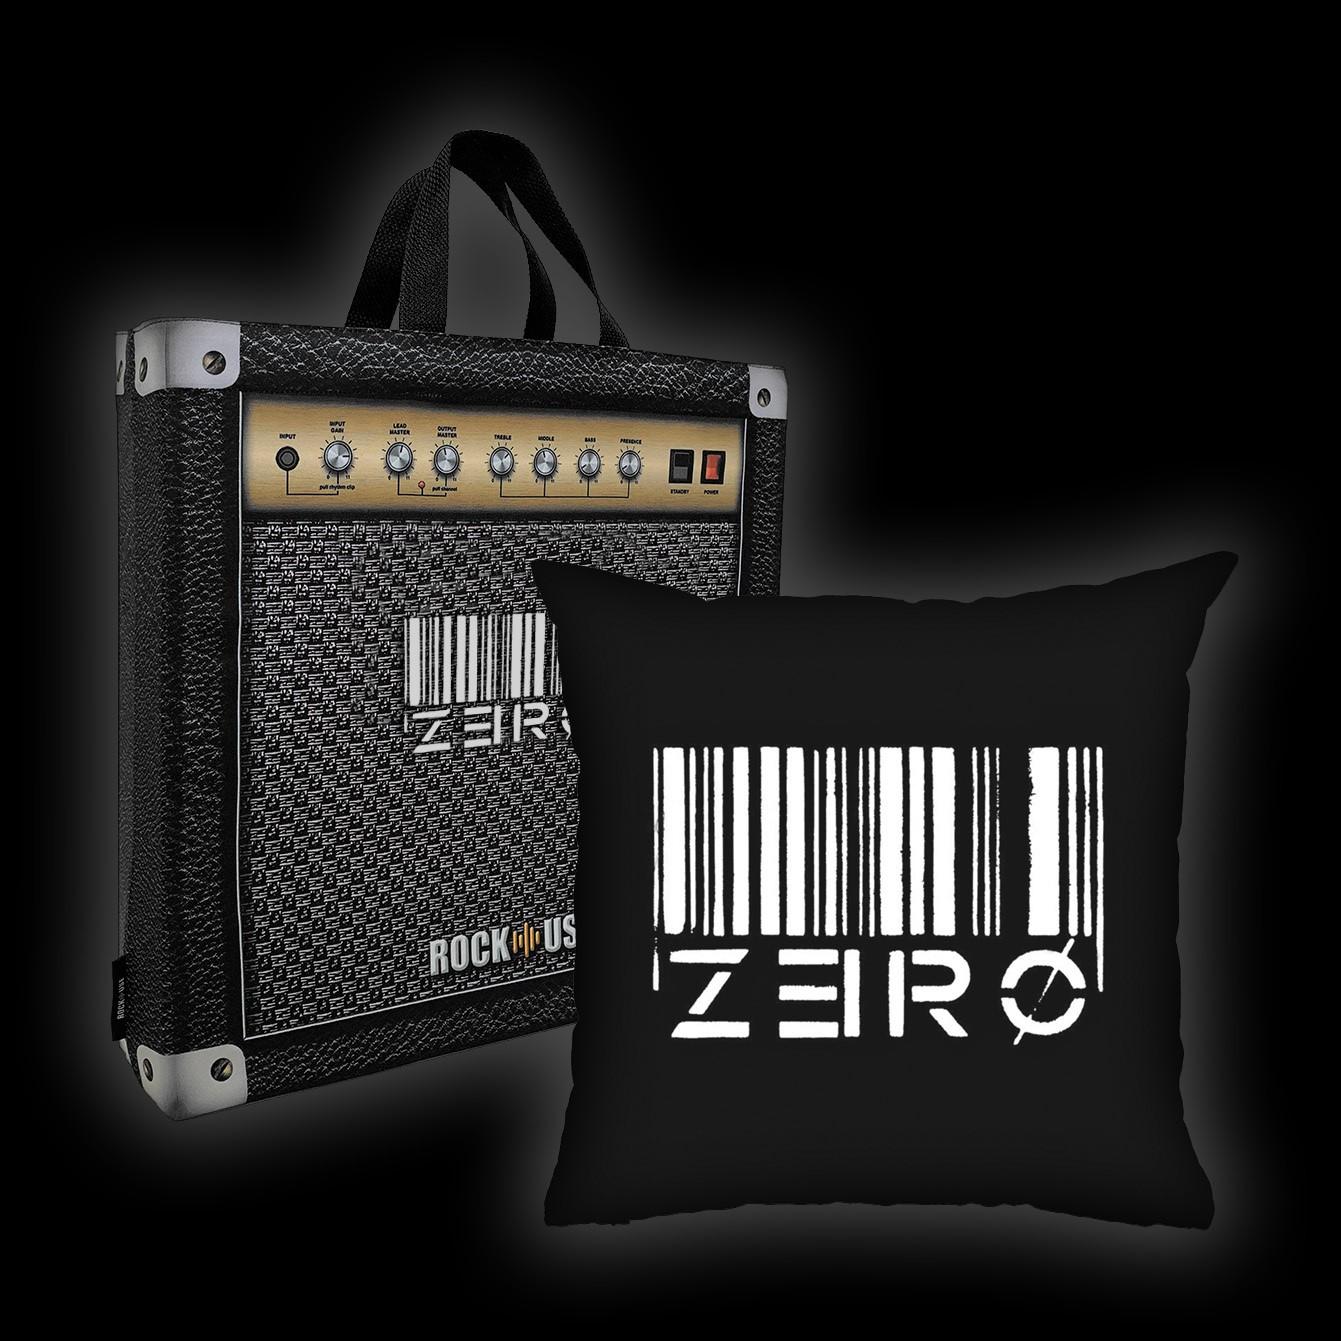 Kit Almofada + Sacola Zero - Code Zero (Preta)